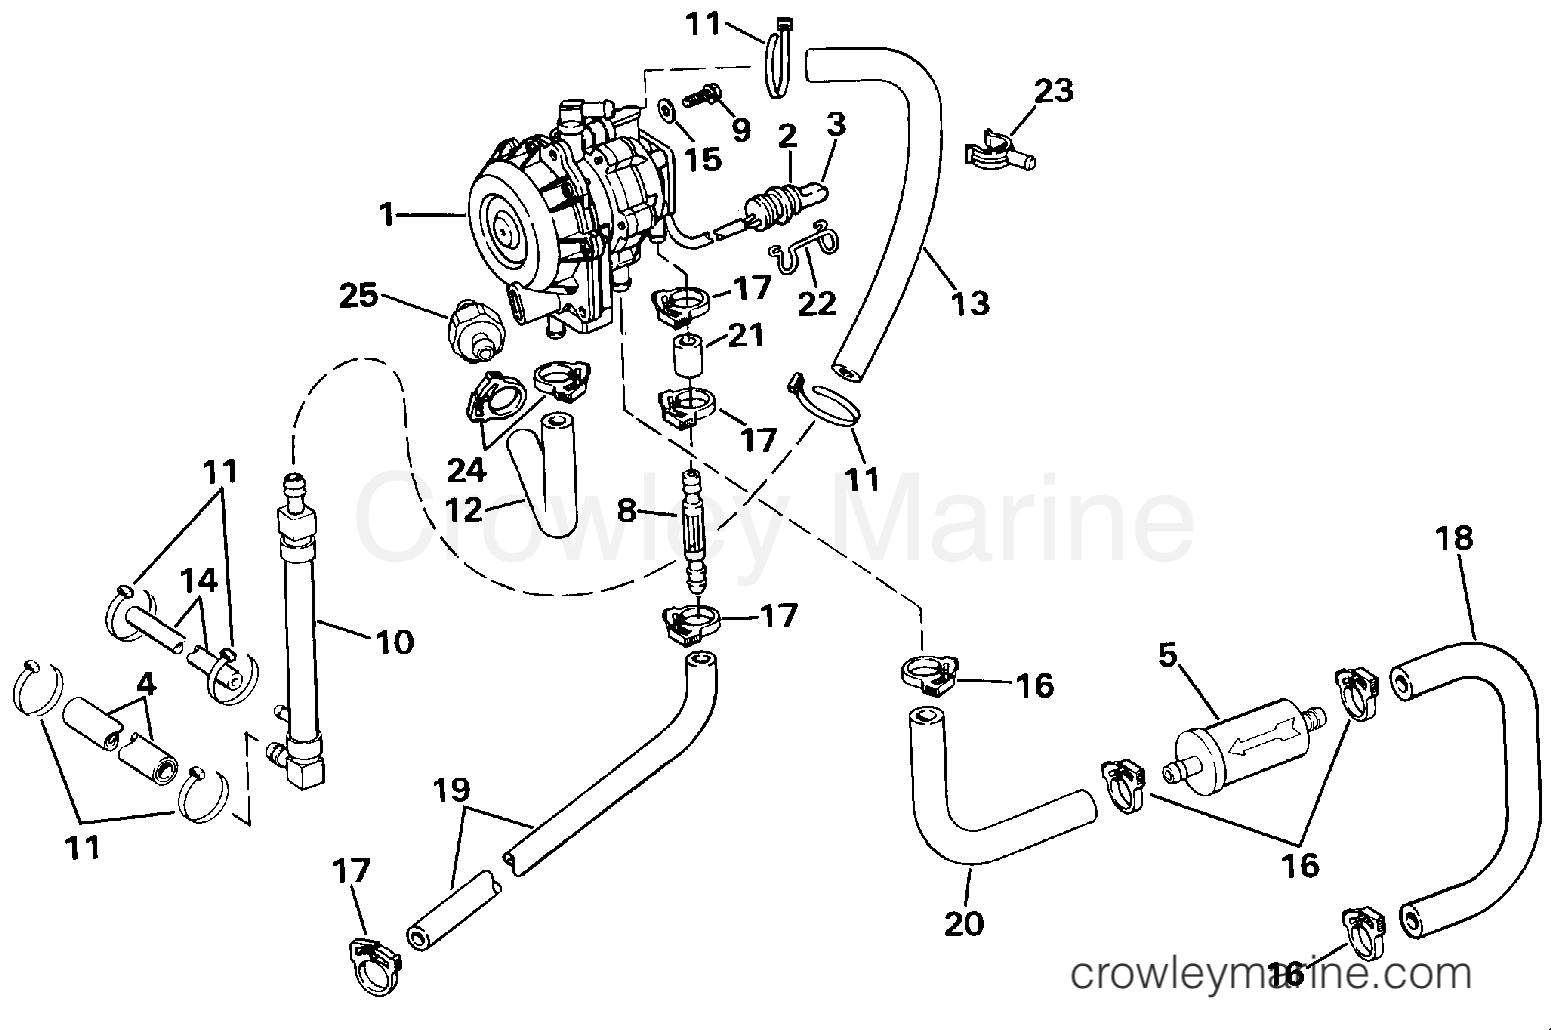 Vro2 Pump